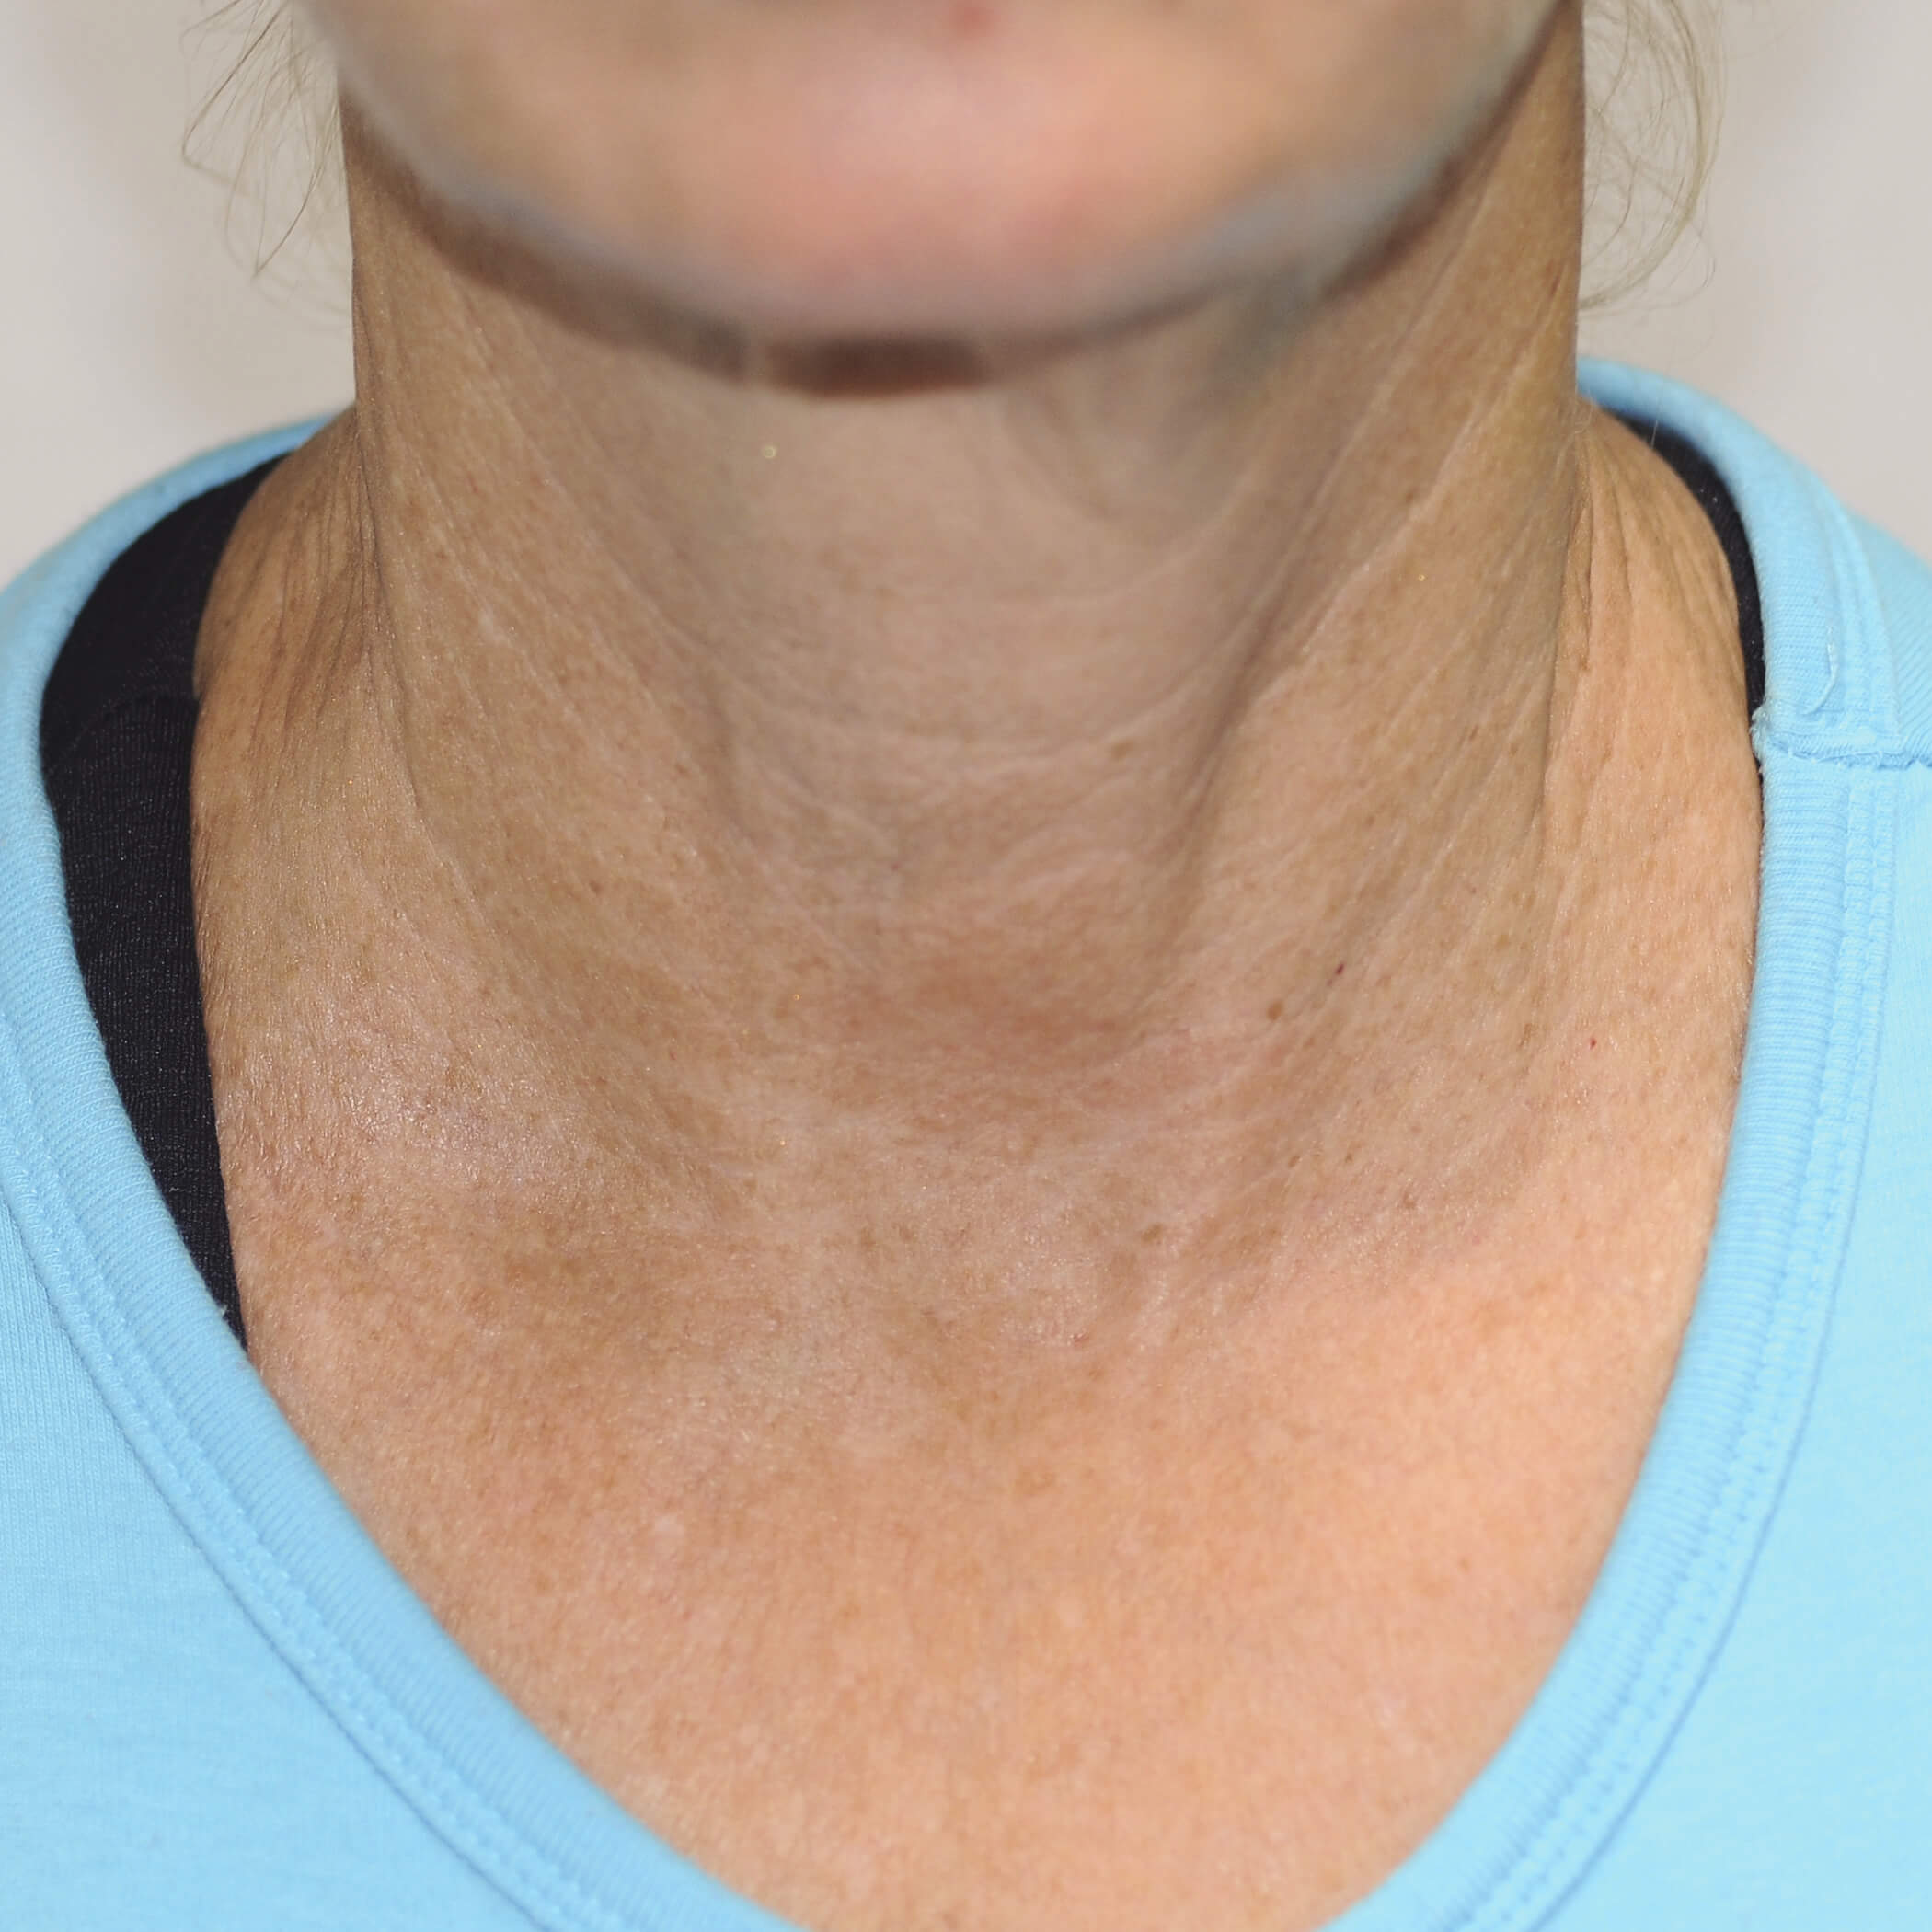 exilis facial skin tightening after neck